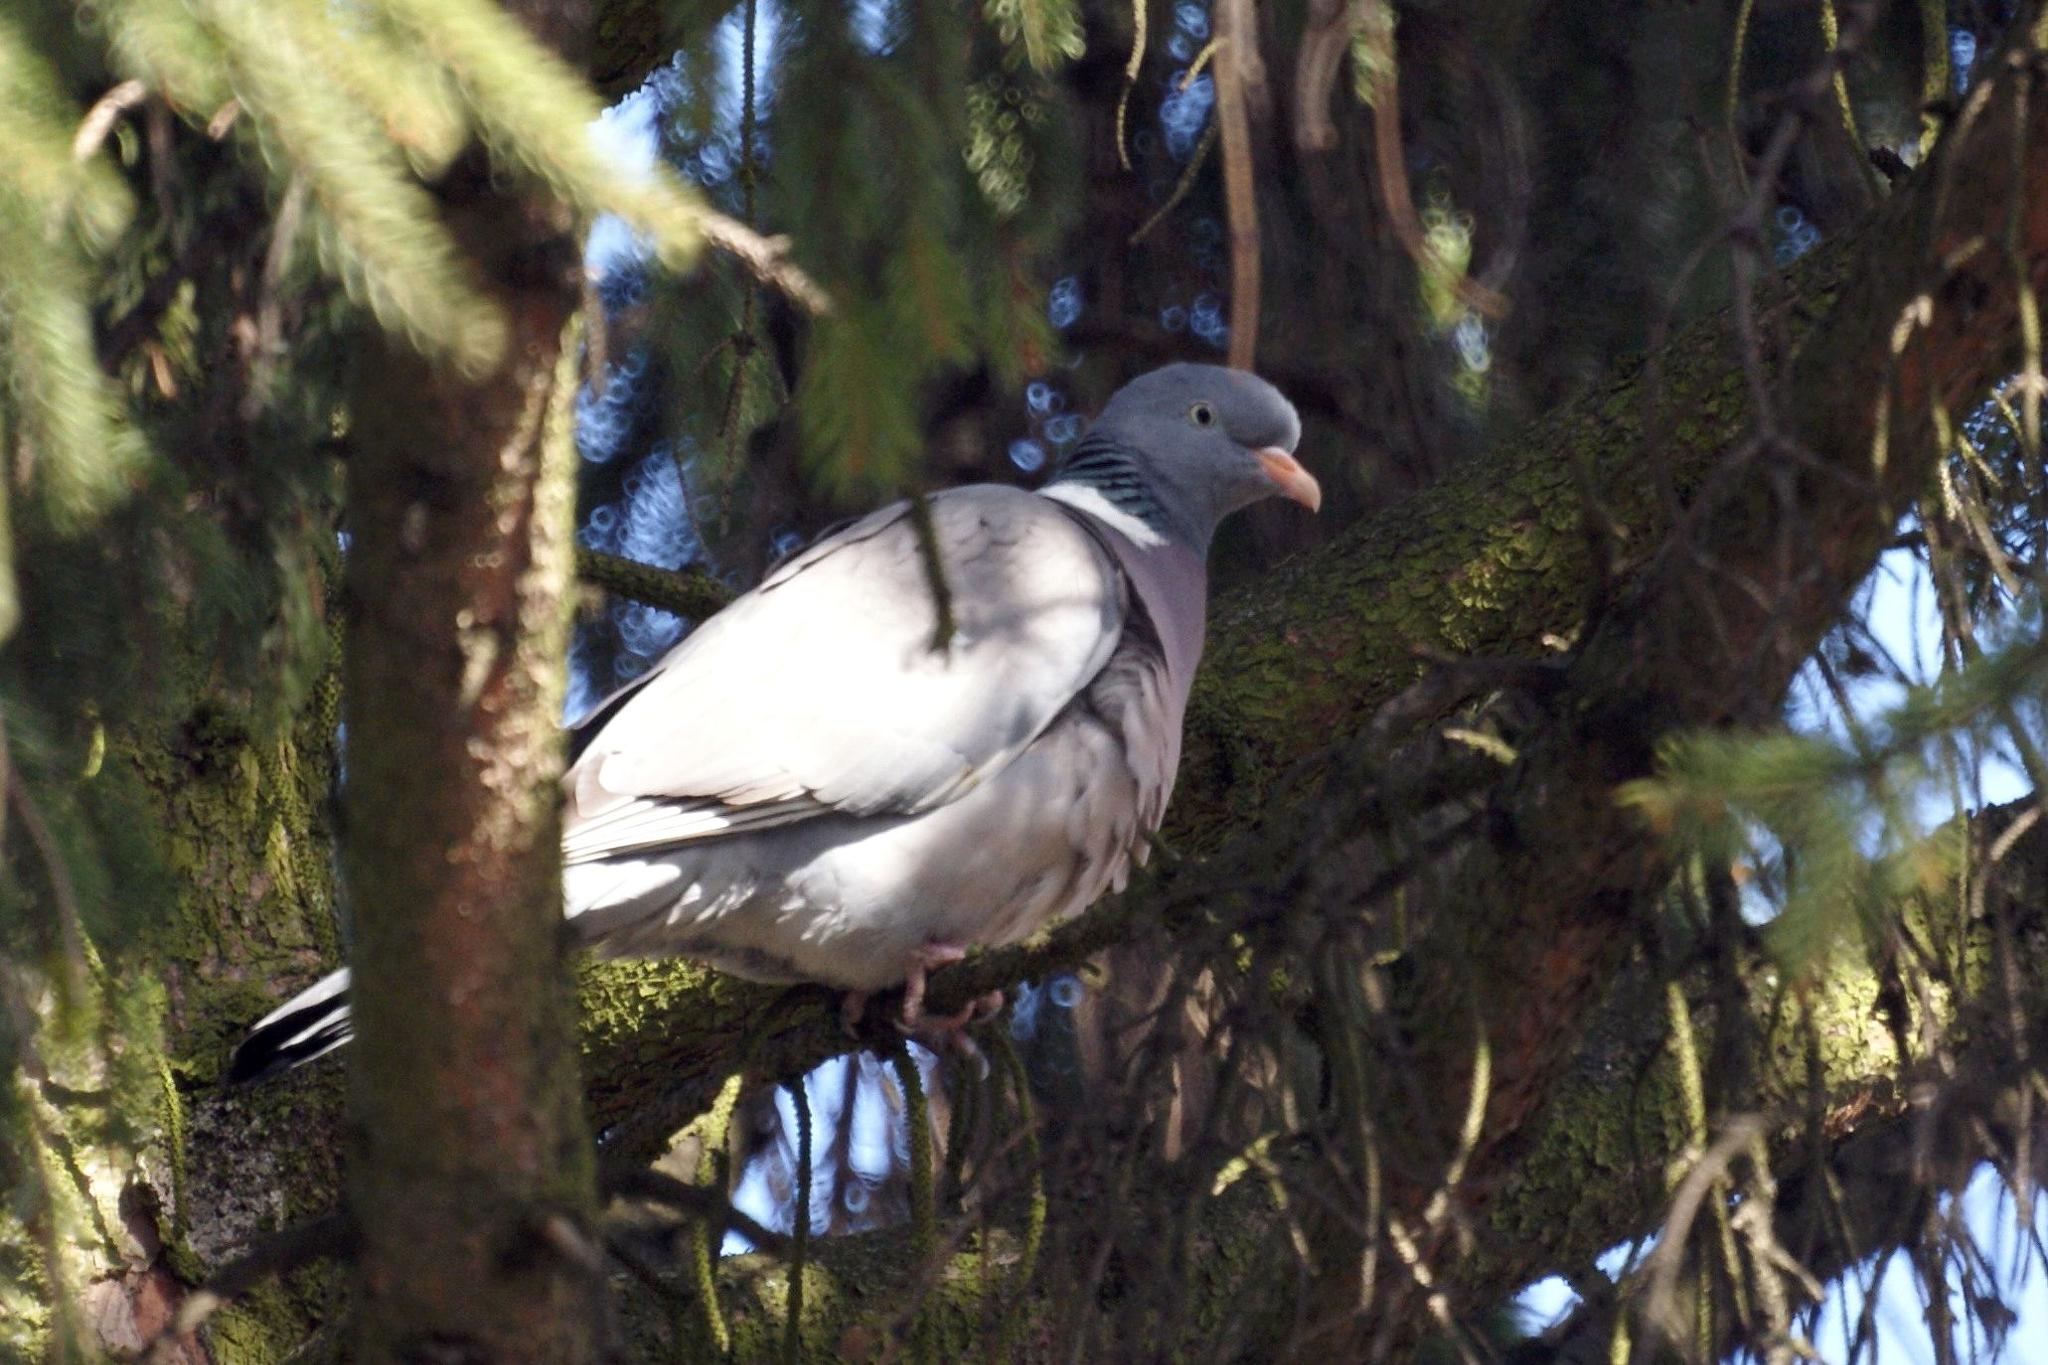 Ring Dove/Wood Pigeon (Columba palumbus) by hunyadigeza